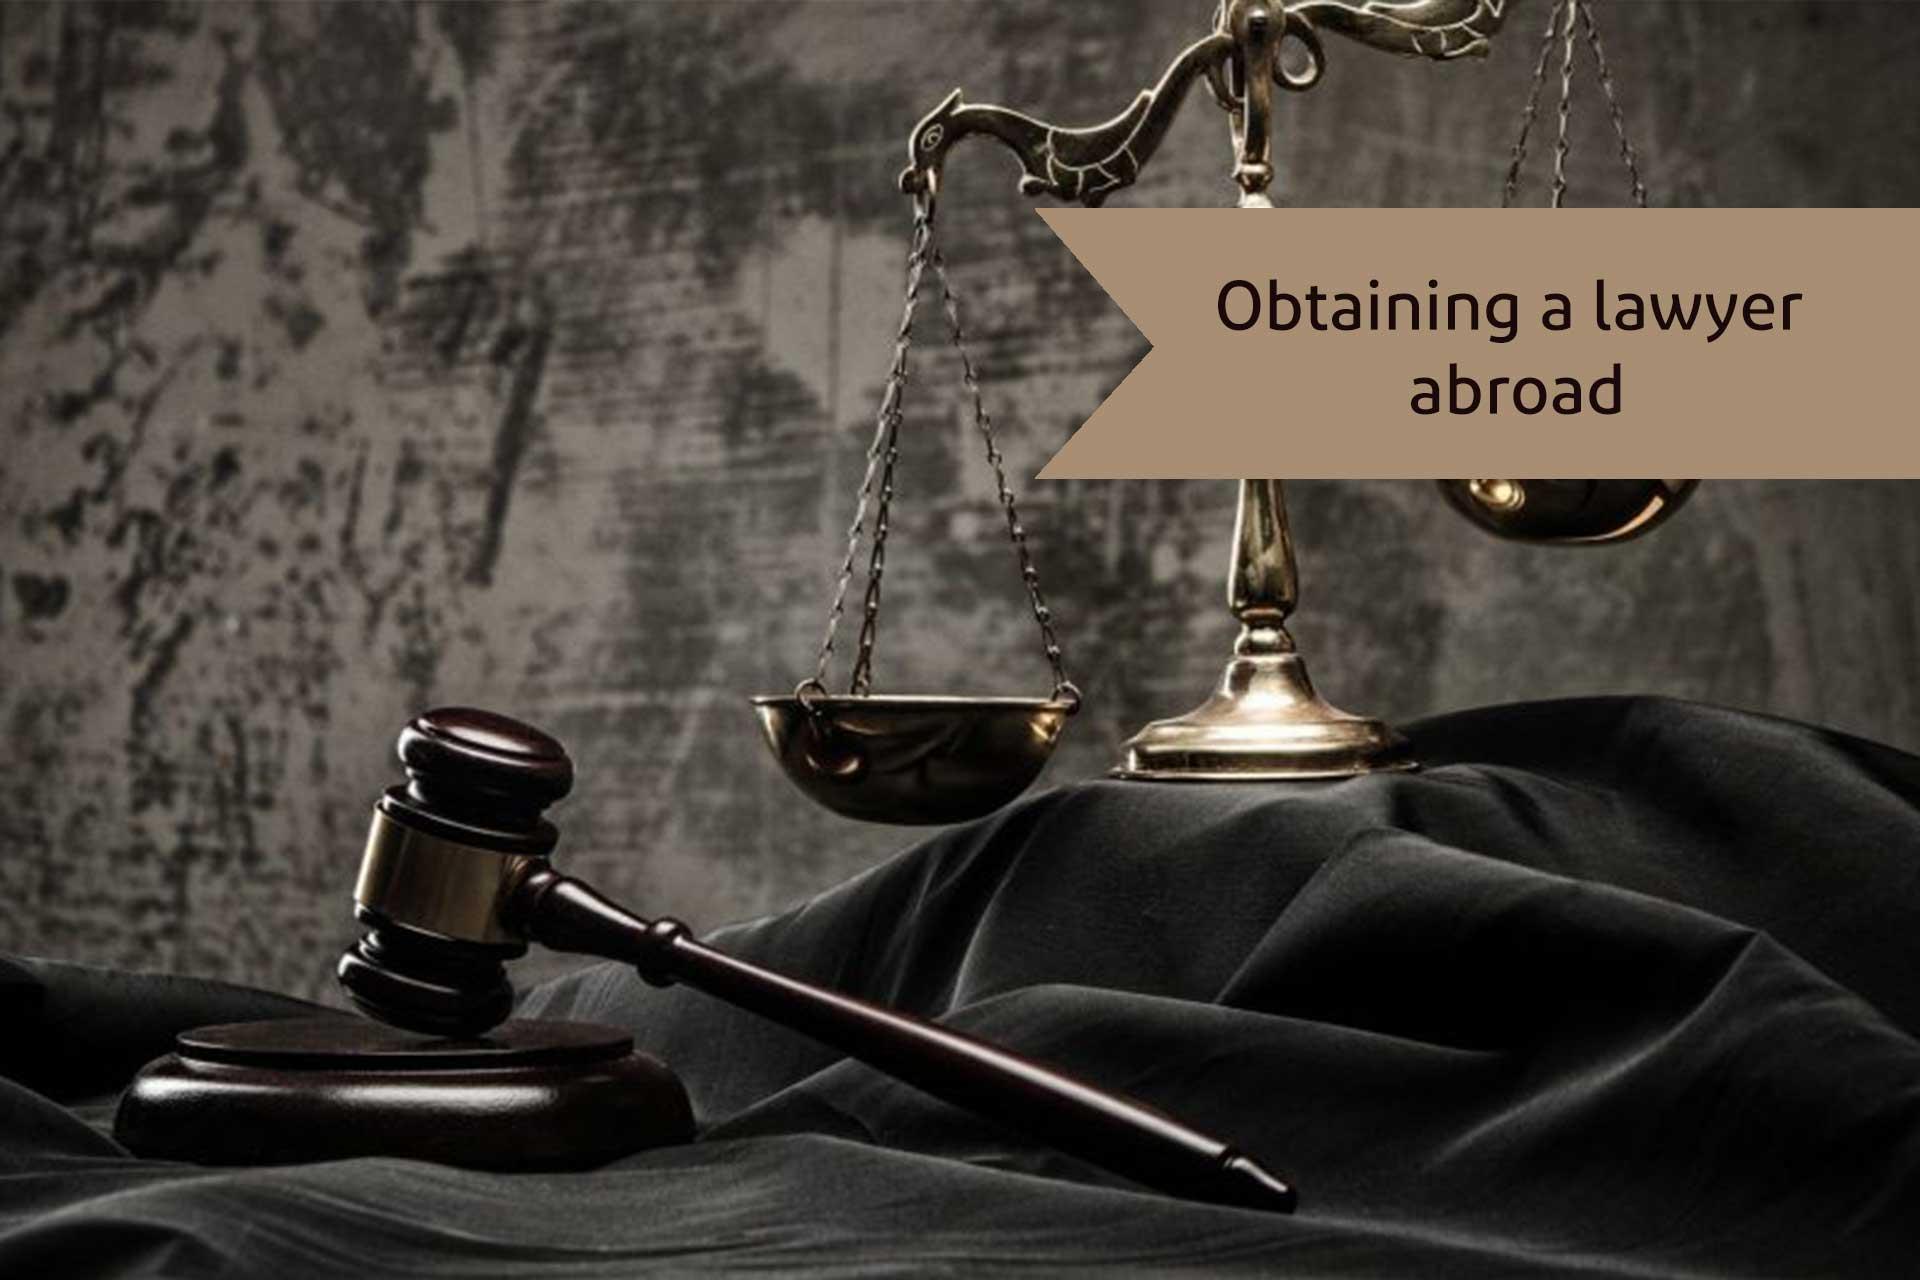 Obtaining a lawyer abroad-alemohamadlaw